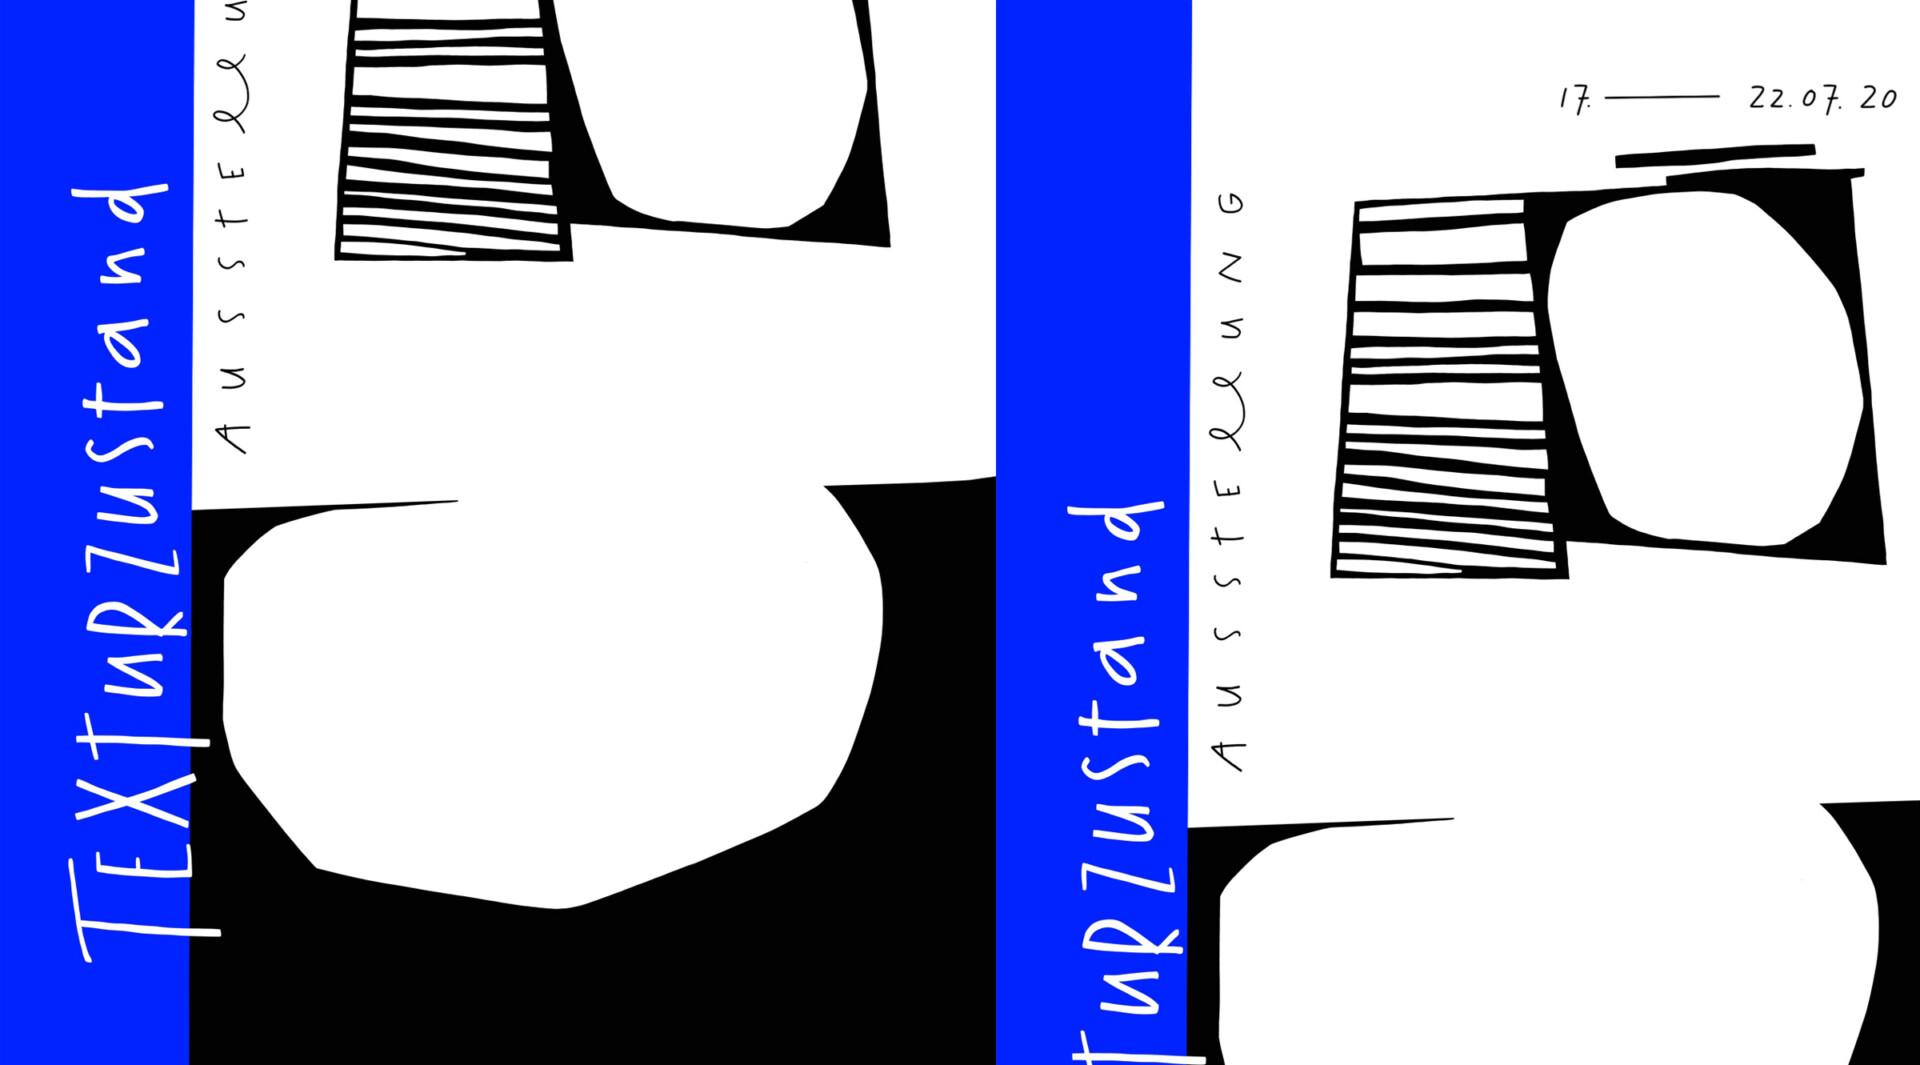 Ausstellung Texturzustand